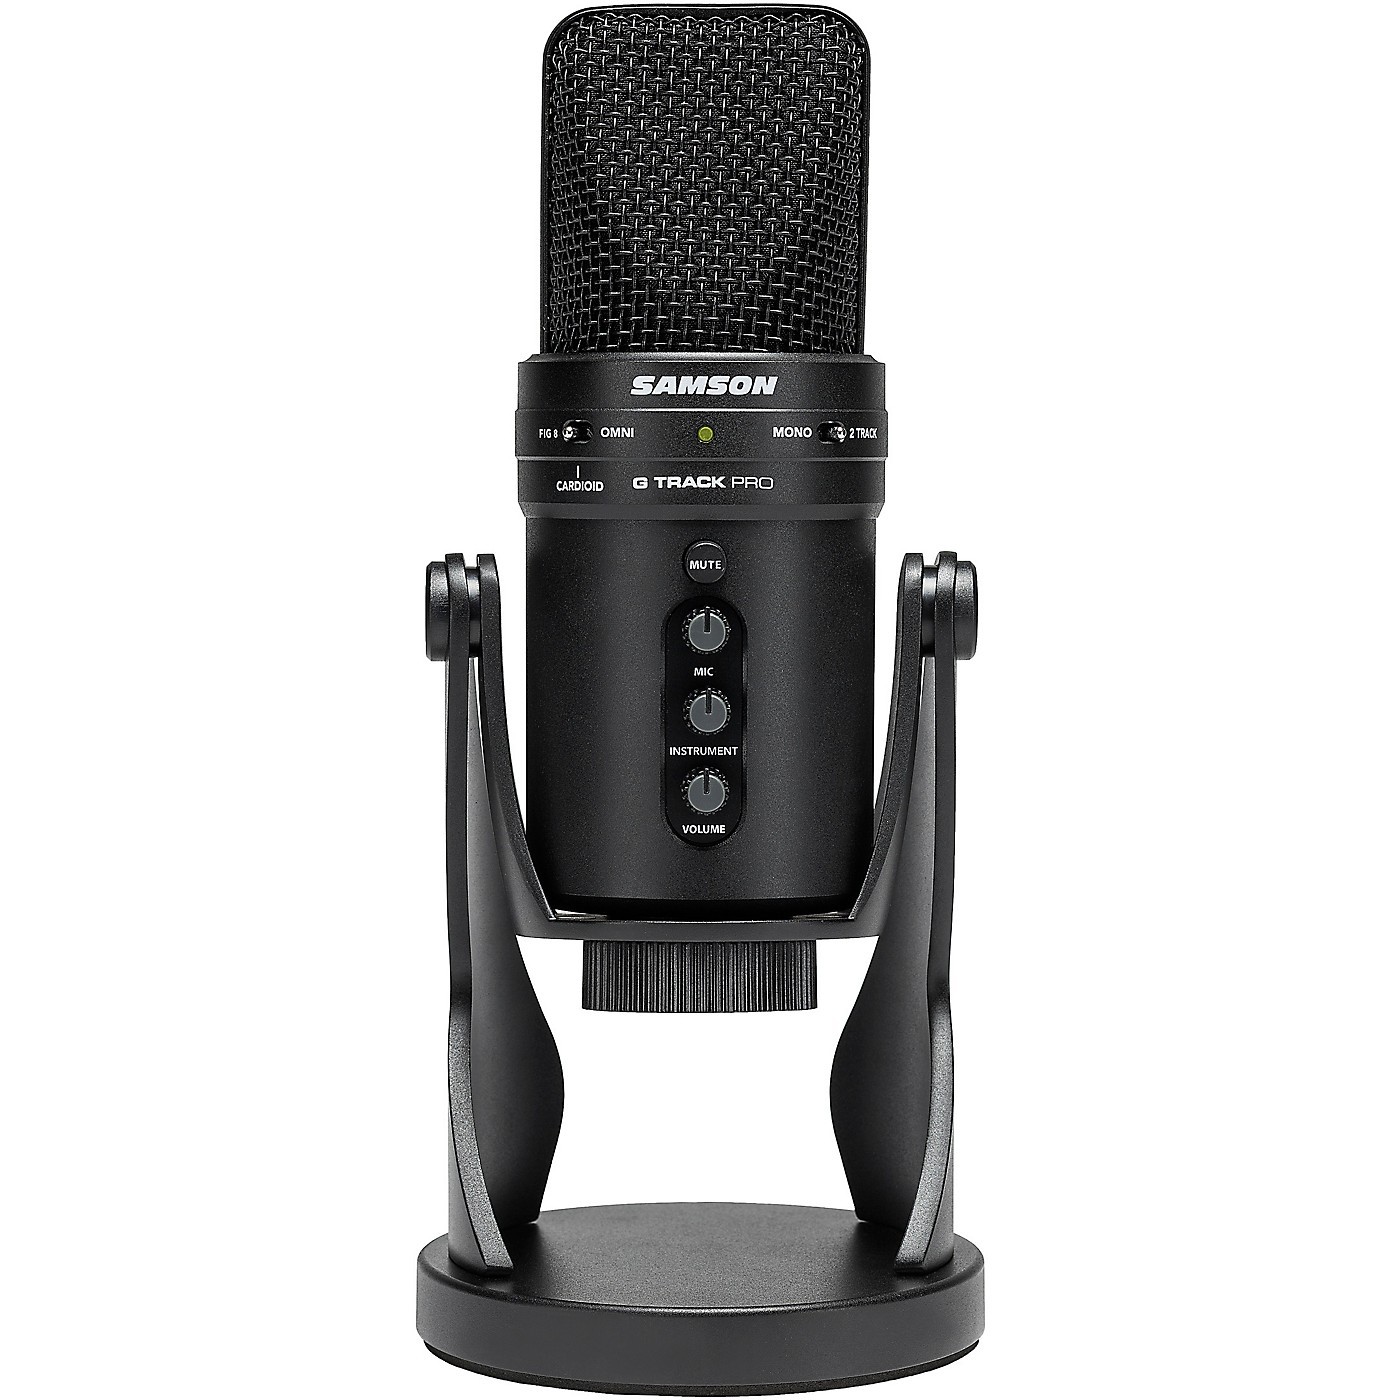 Samson G track Pro USB 24-bit Studio Condenser Mic with Audio Interface thumbnail